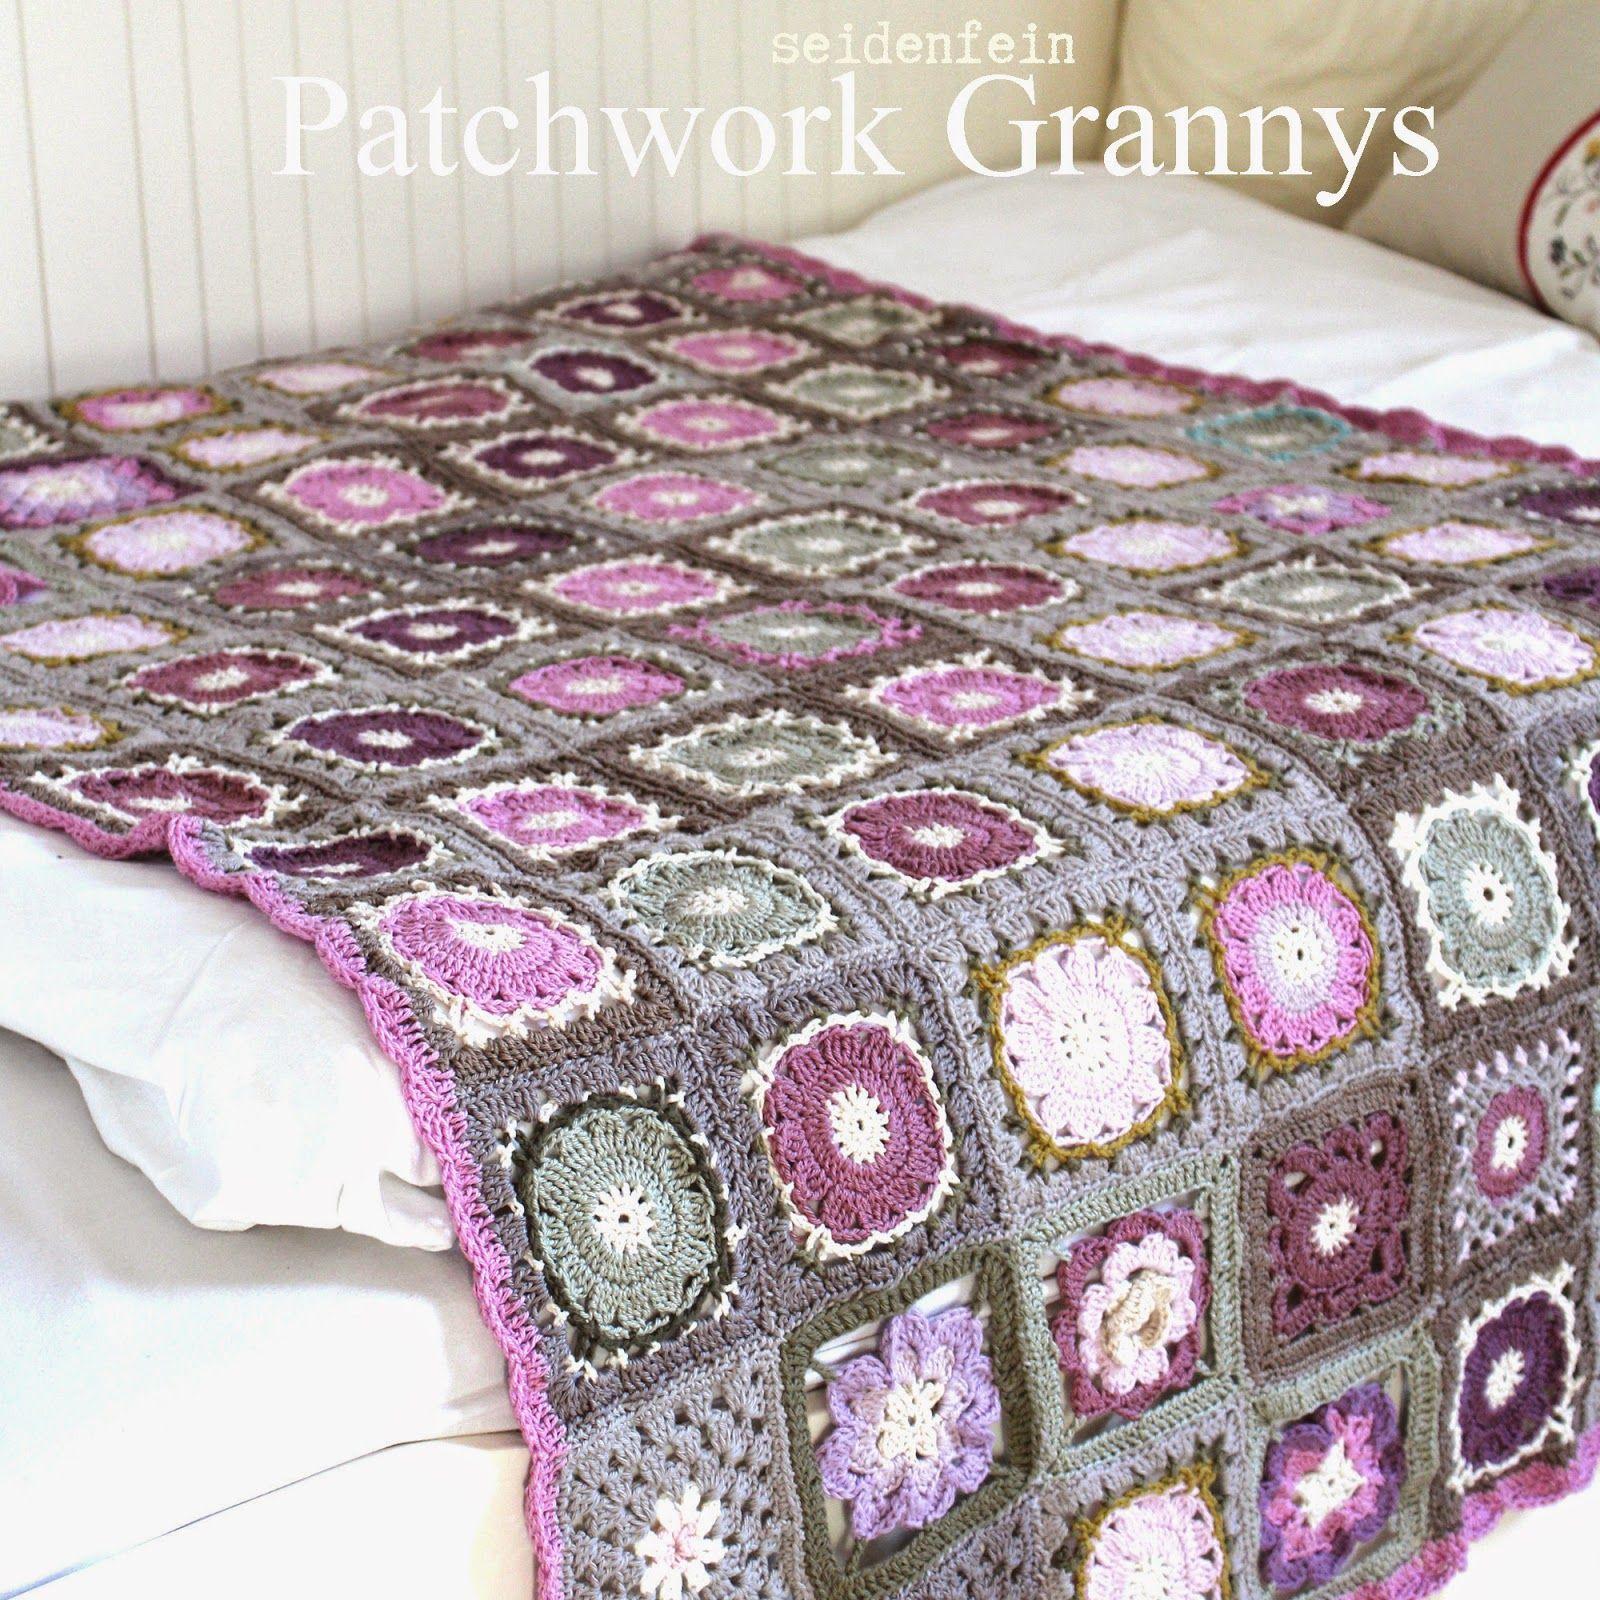 seidenfeins dekoblog h keldecke aus patchwork grannys crochet blanket no 3 h keln. Black Bedroom Furniture Sets. Home Design Ideas